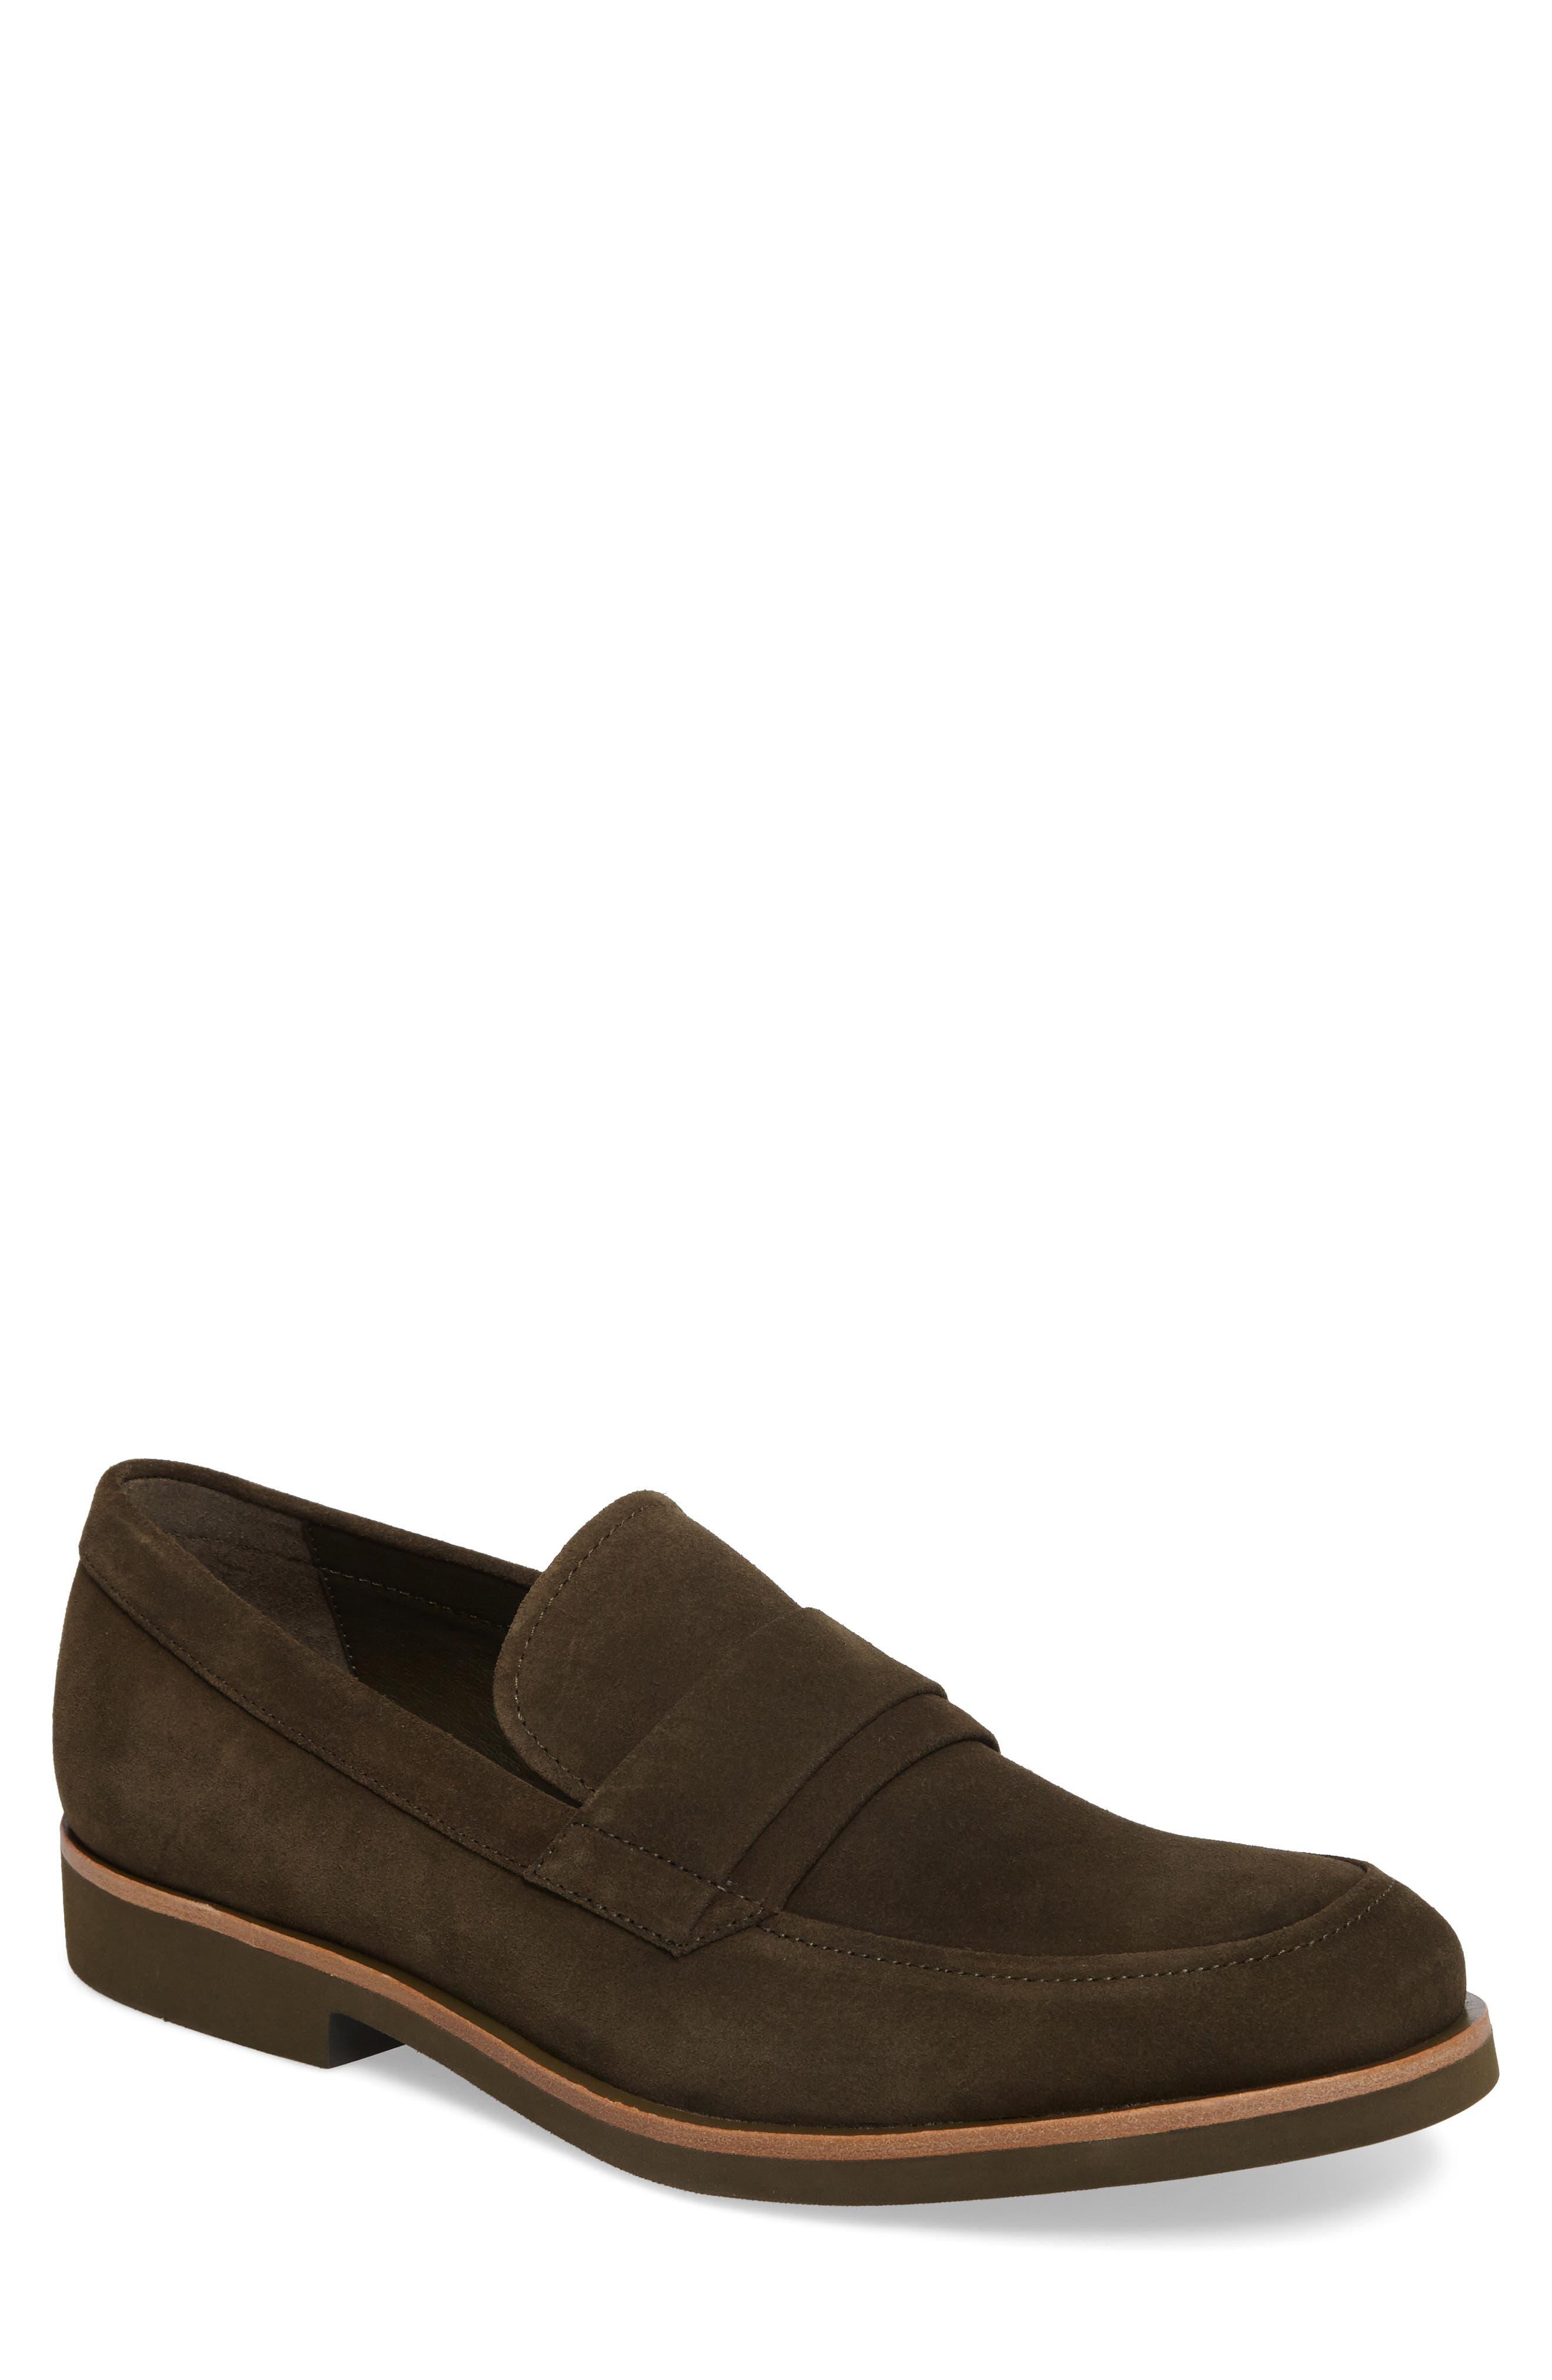 Forbes Loafer,                         Main,                         color, Olive Suede